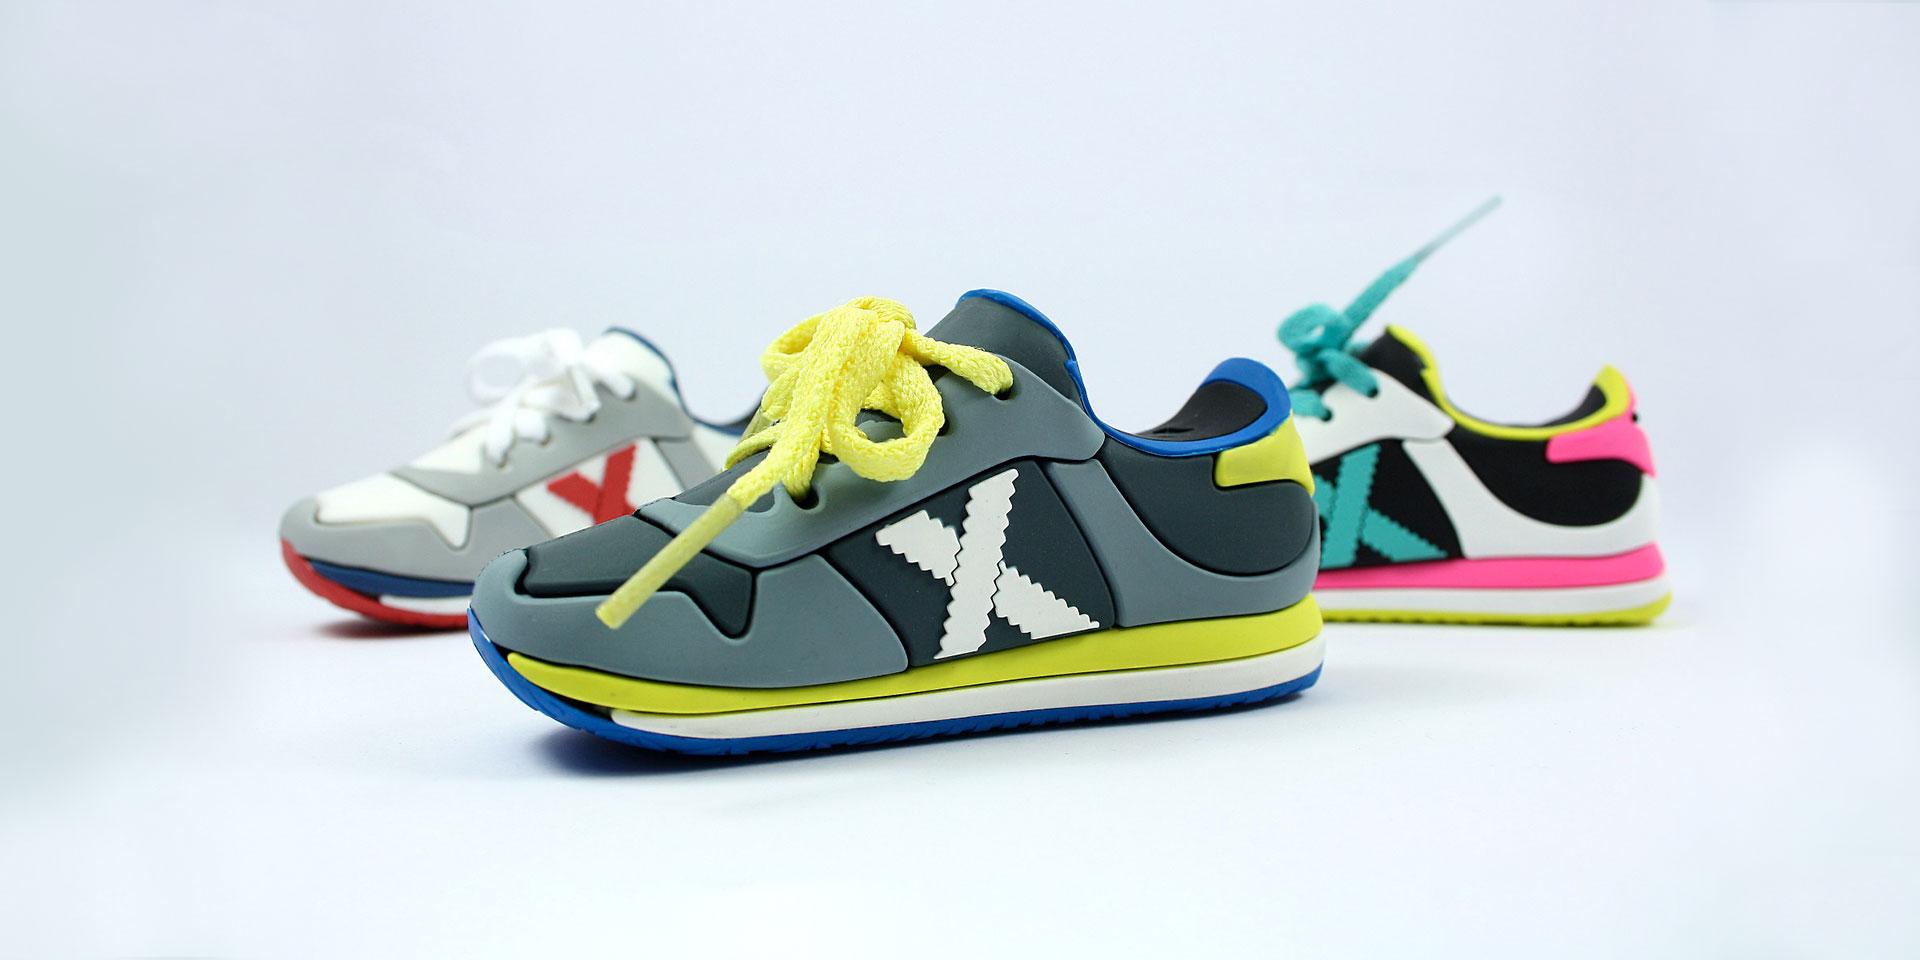 custom power bank shoes brand